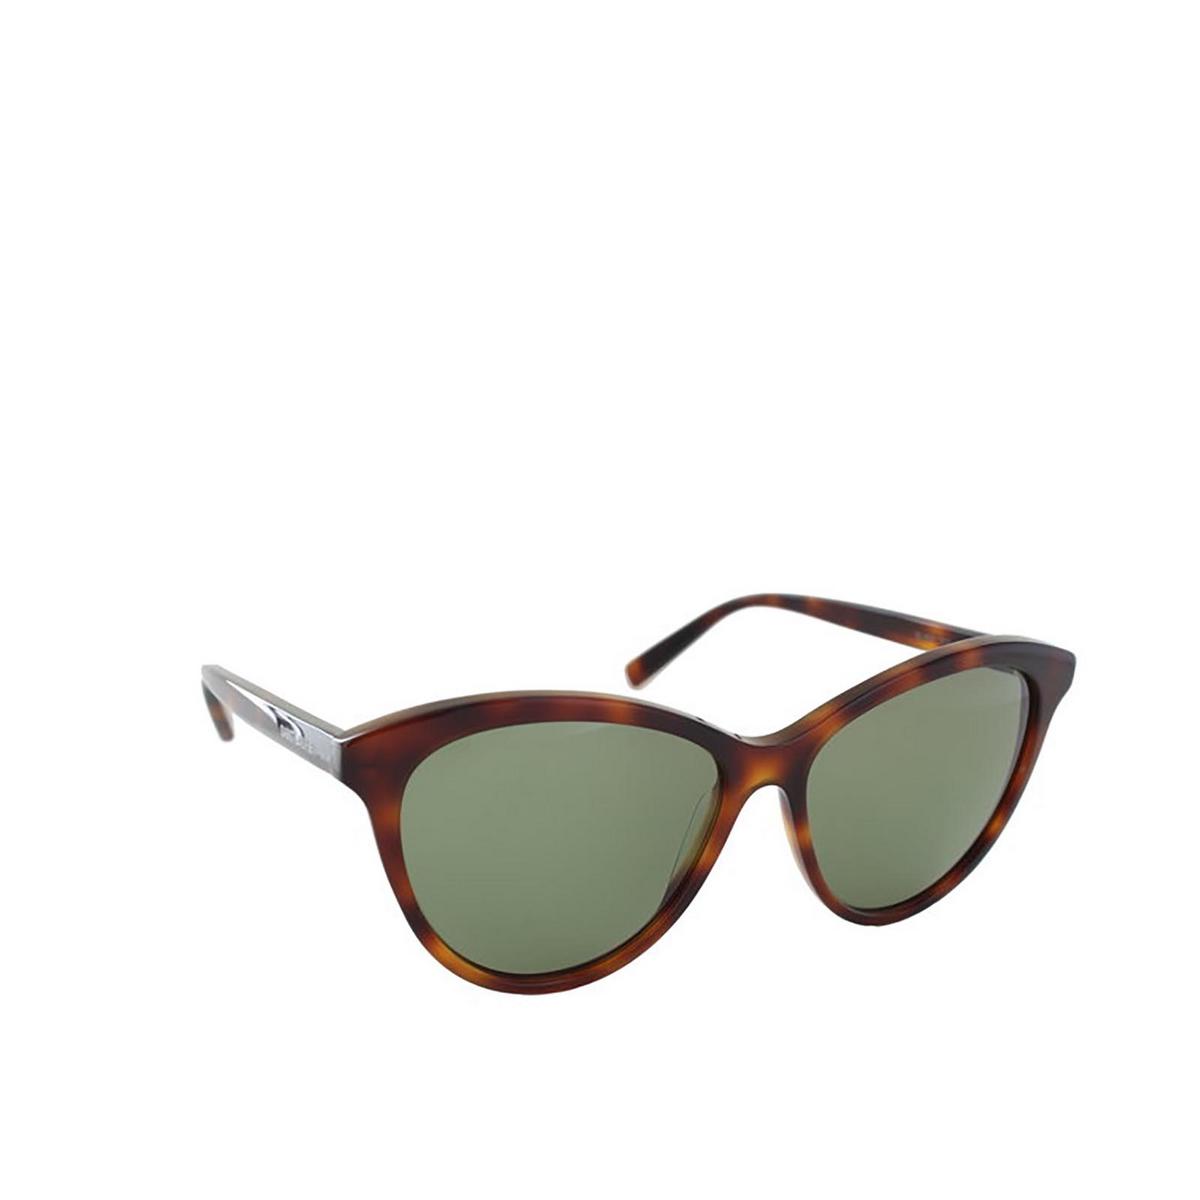 Saint Laurent® Cat-eye Sunglasses: SL 456 color Havana 002 - three-quarters view.